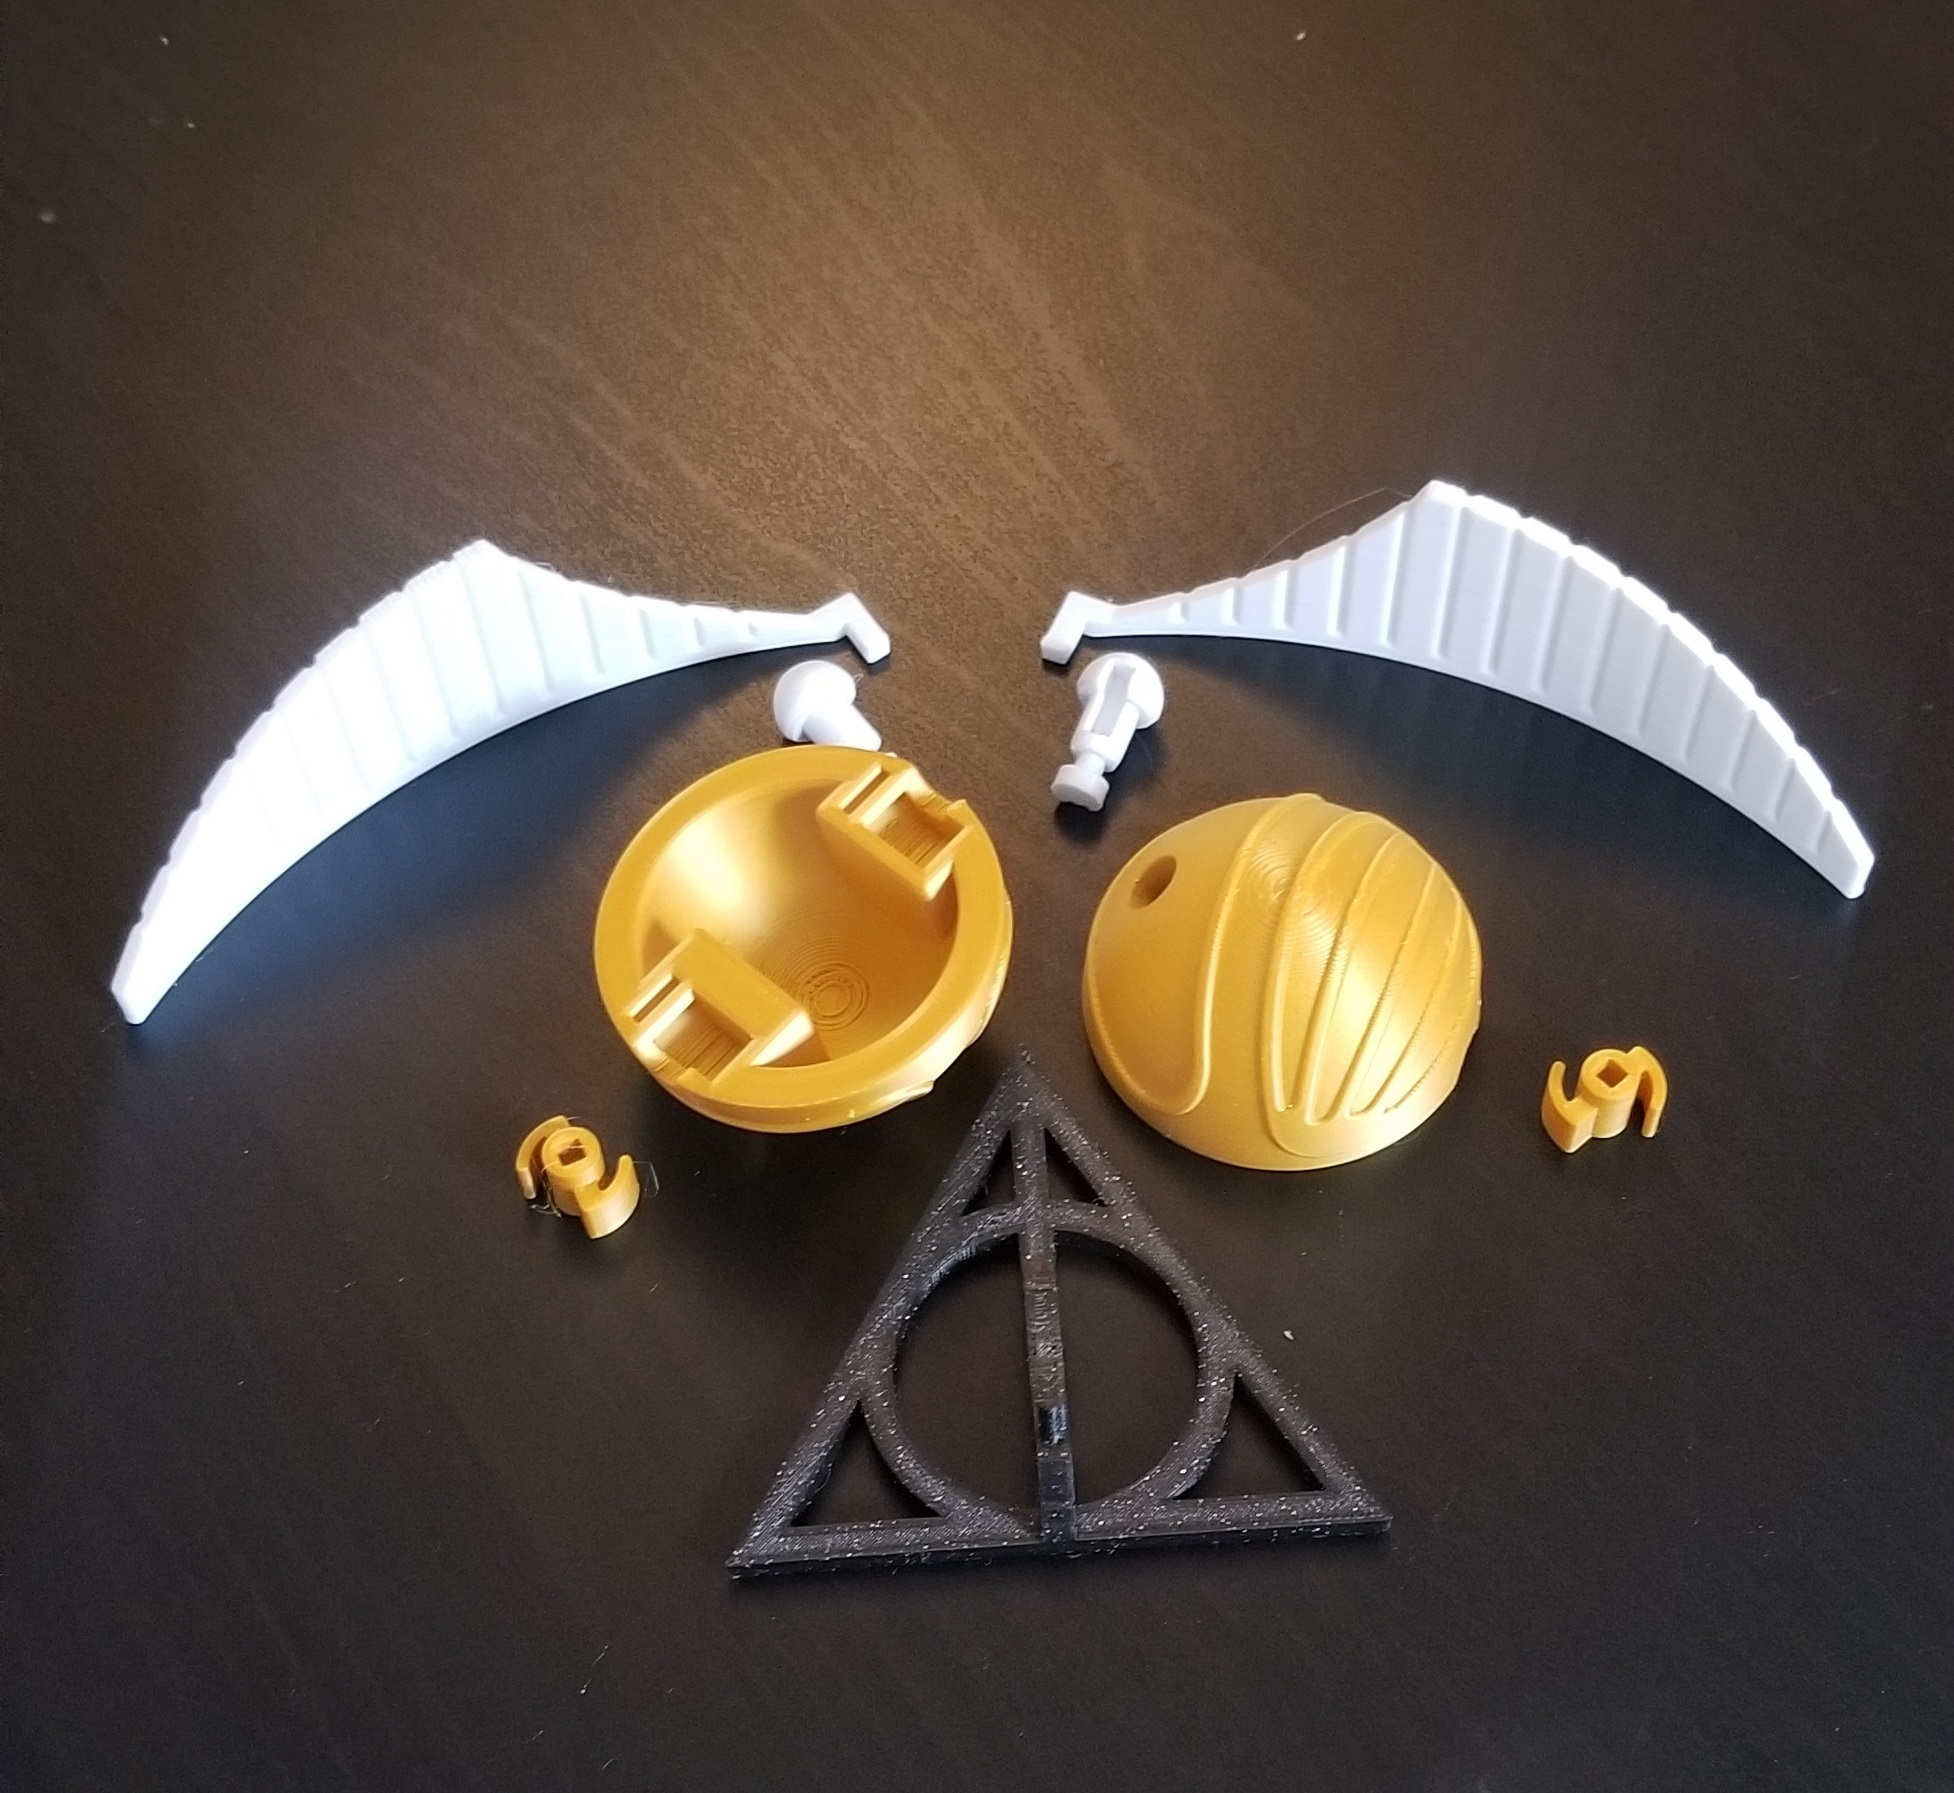 20201017_152037.jpg Download STL file Golden snitch Puzzle • Model to 3D print, 3DPrintersaur